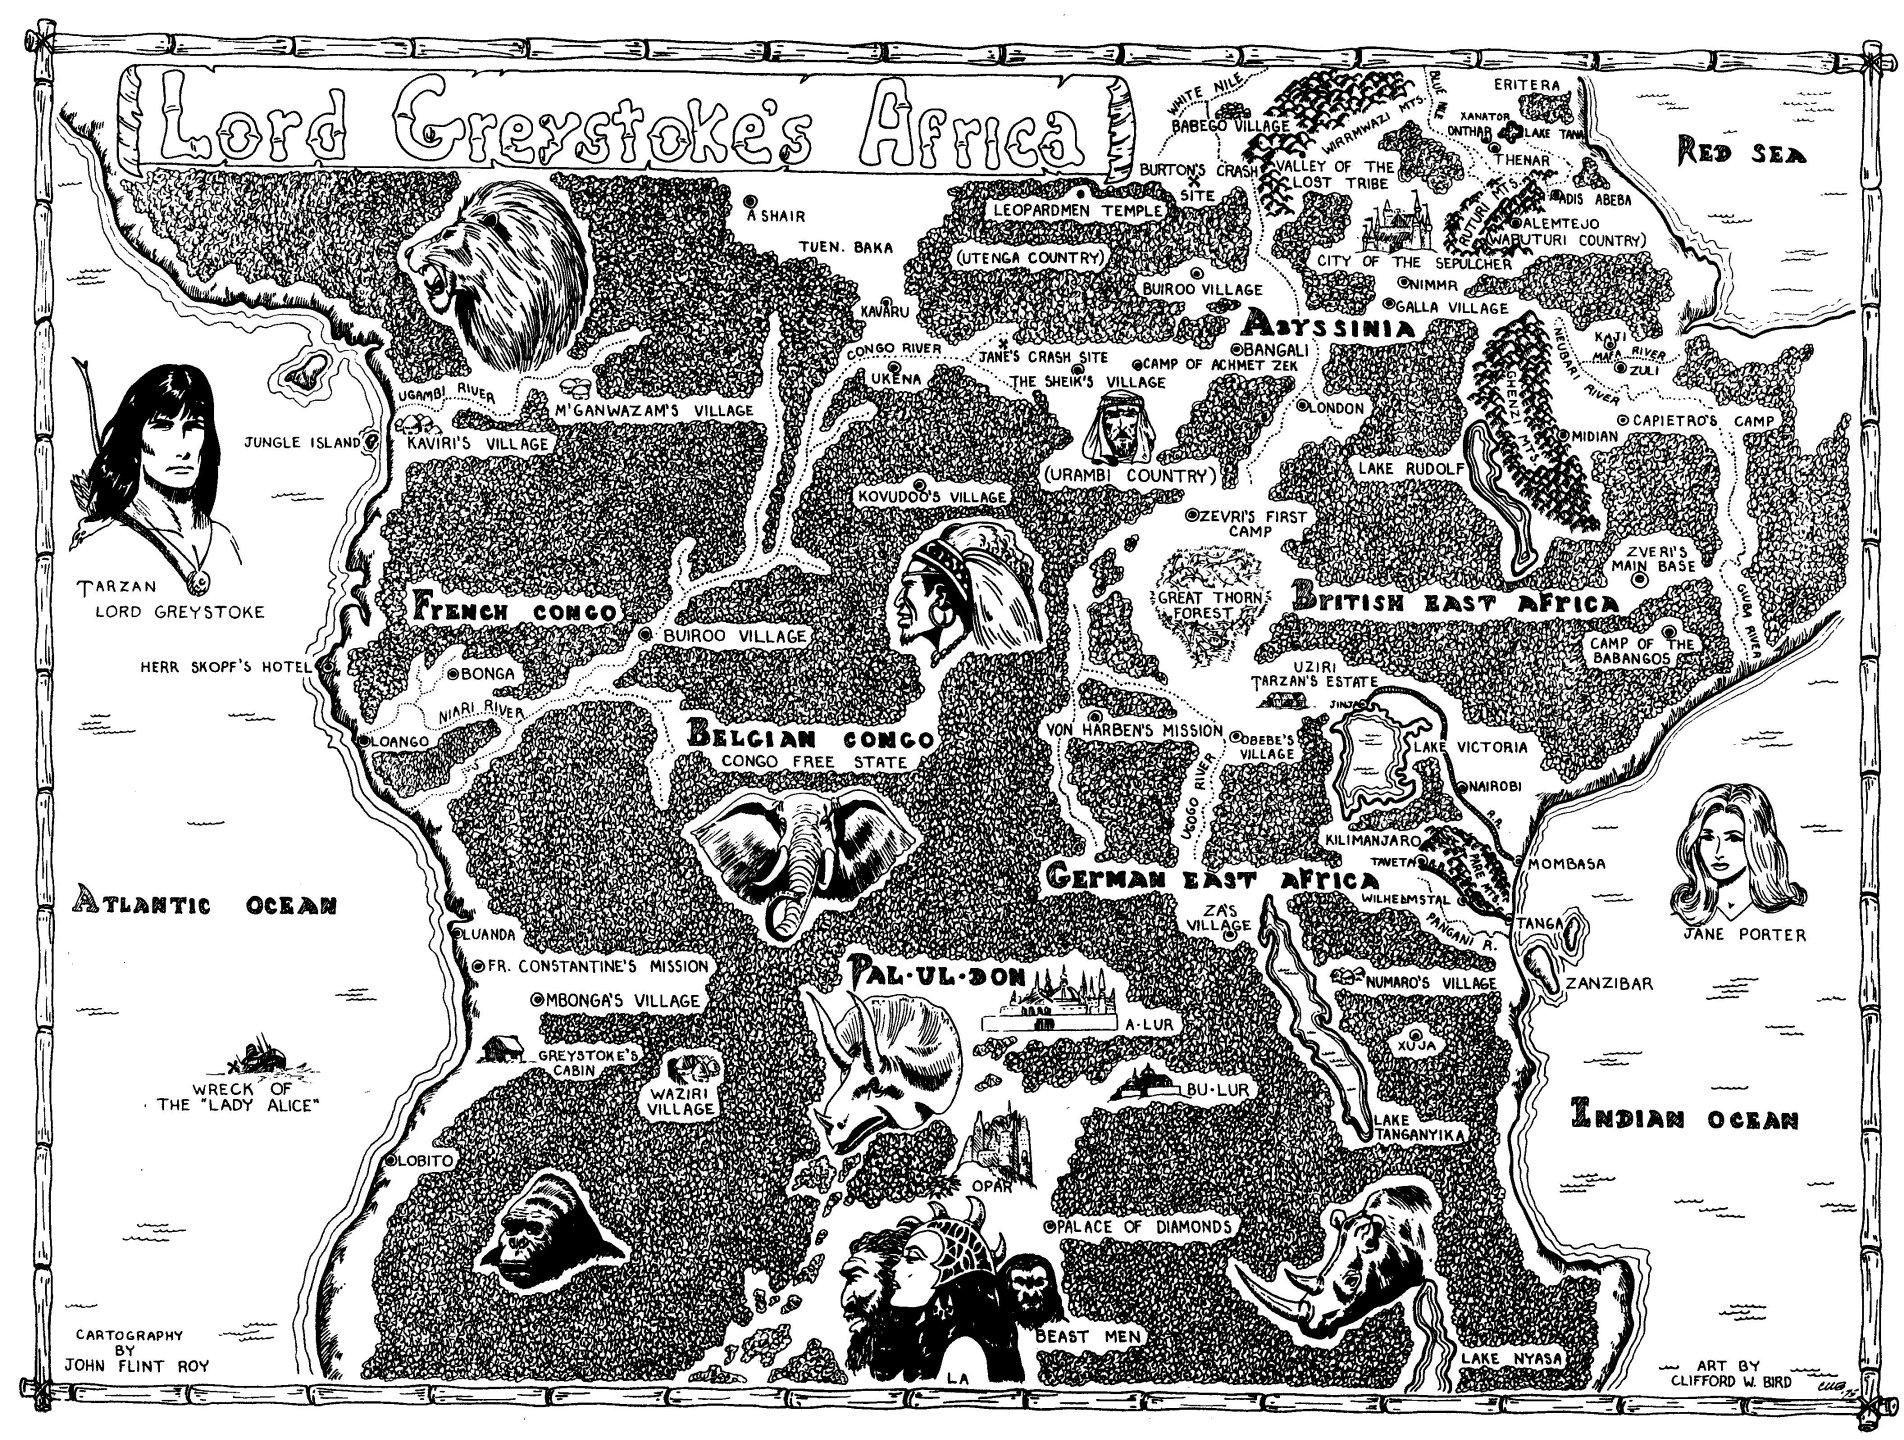 karten merken system